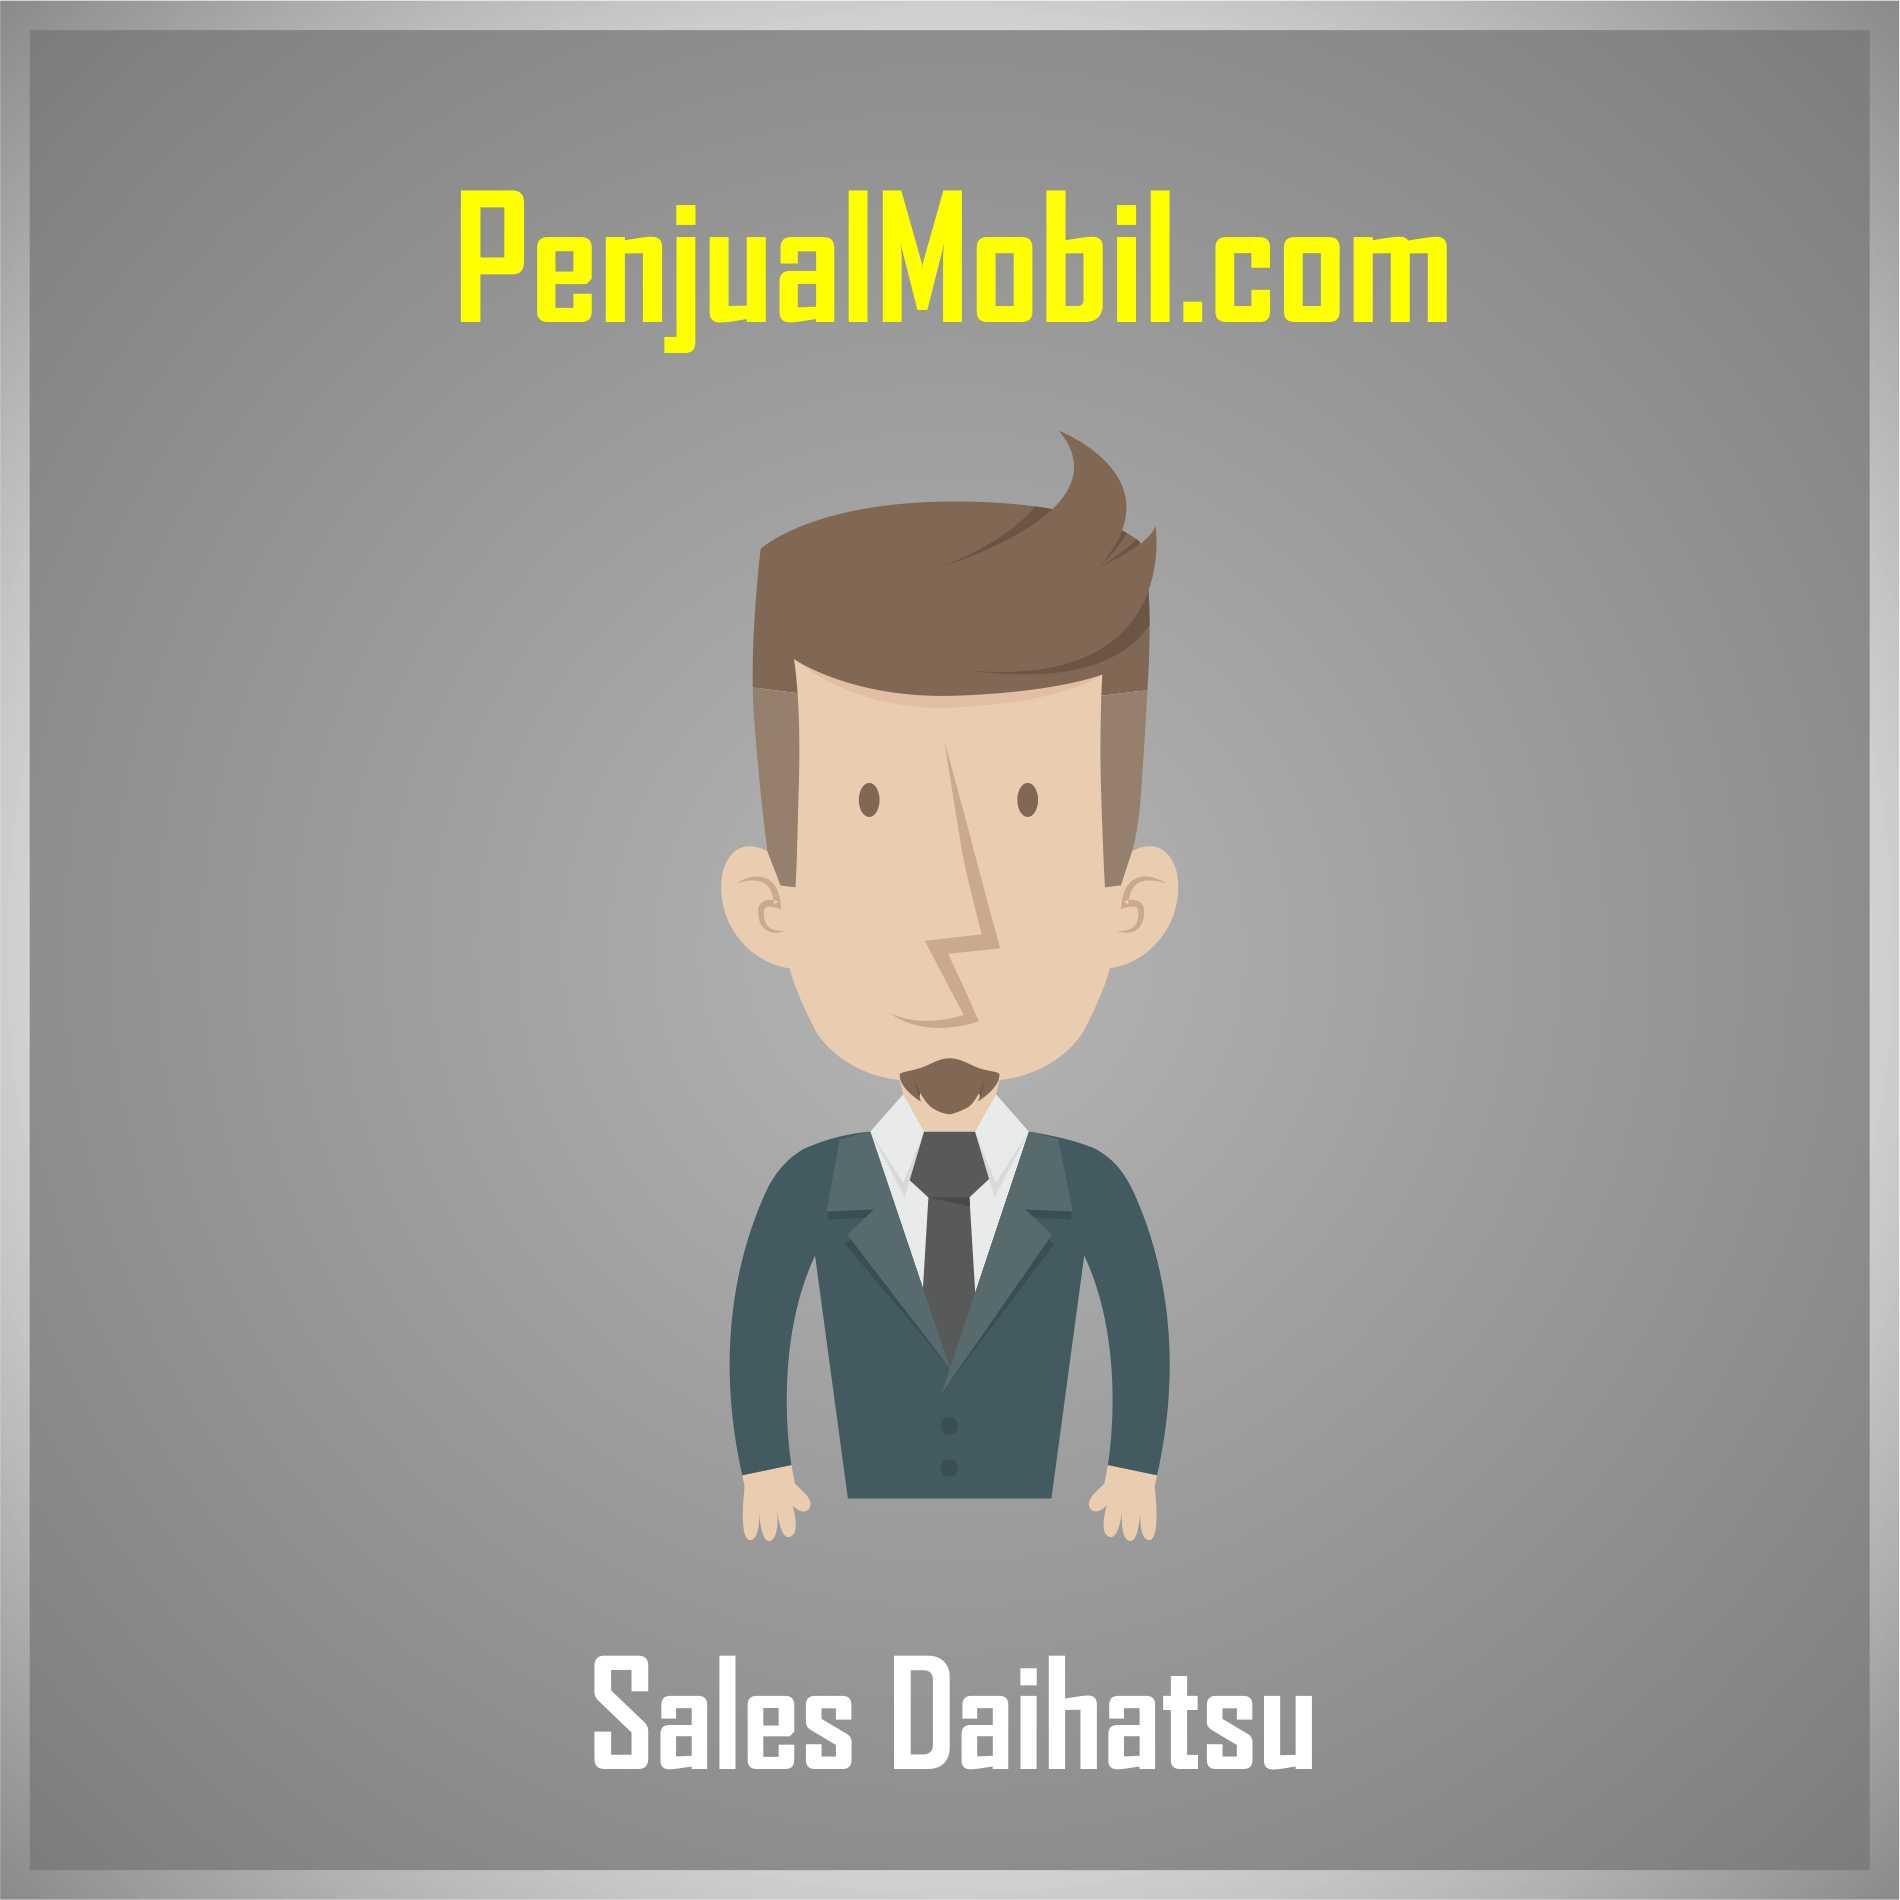 Daihatsu pangandaran